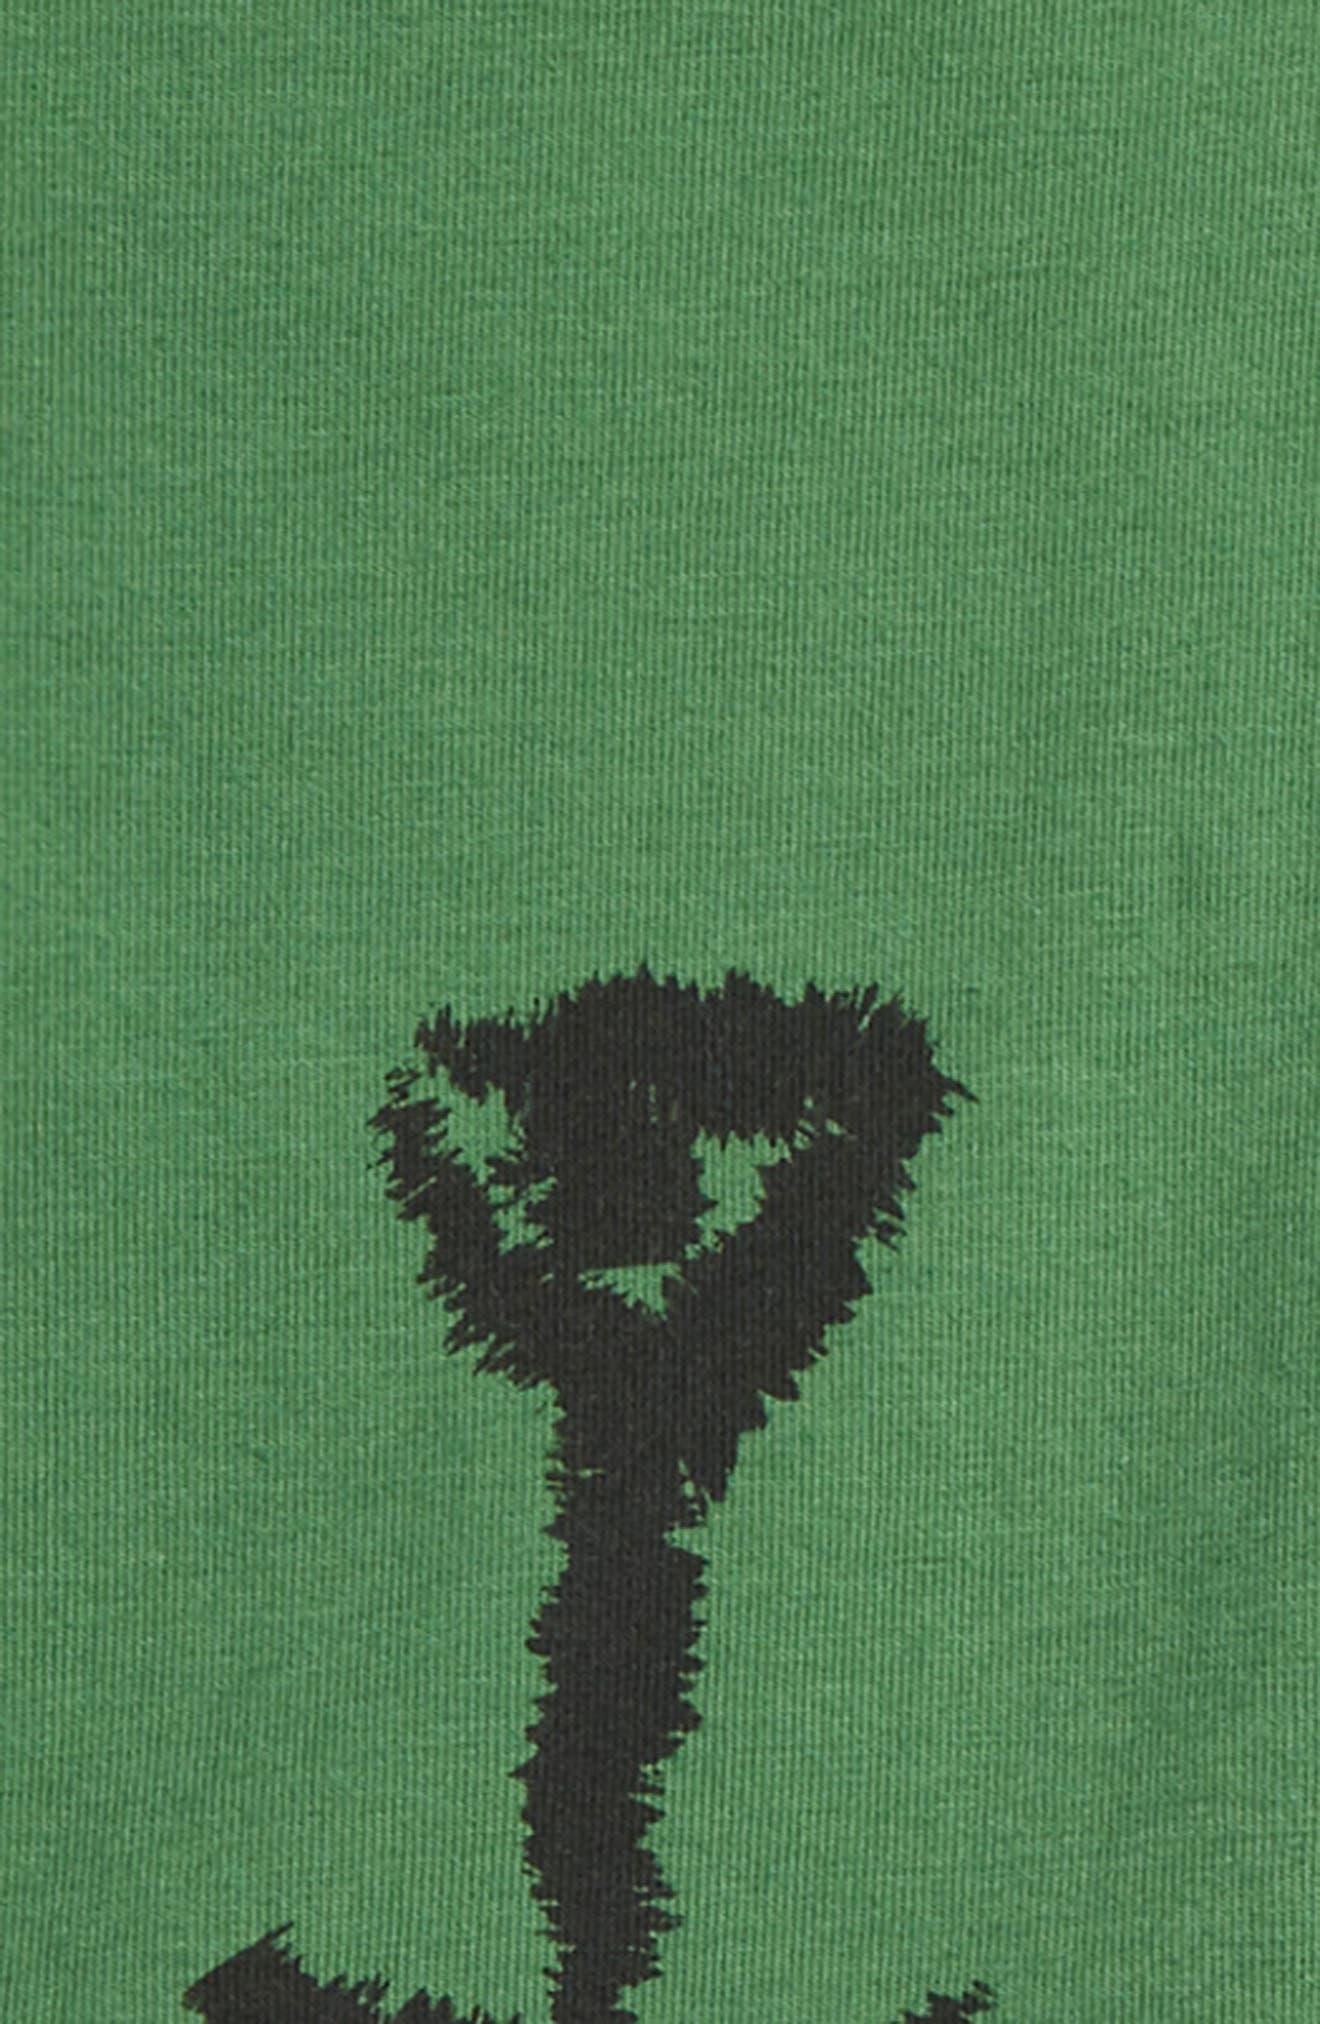 Honeybear Bodysuit & Pants Set,                             Alternate thumbnail 2, color,                             Green/ Black